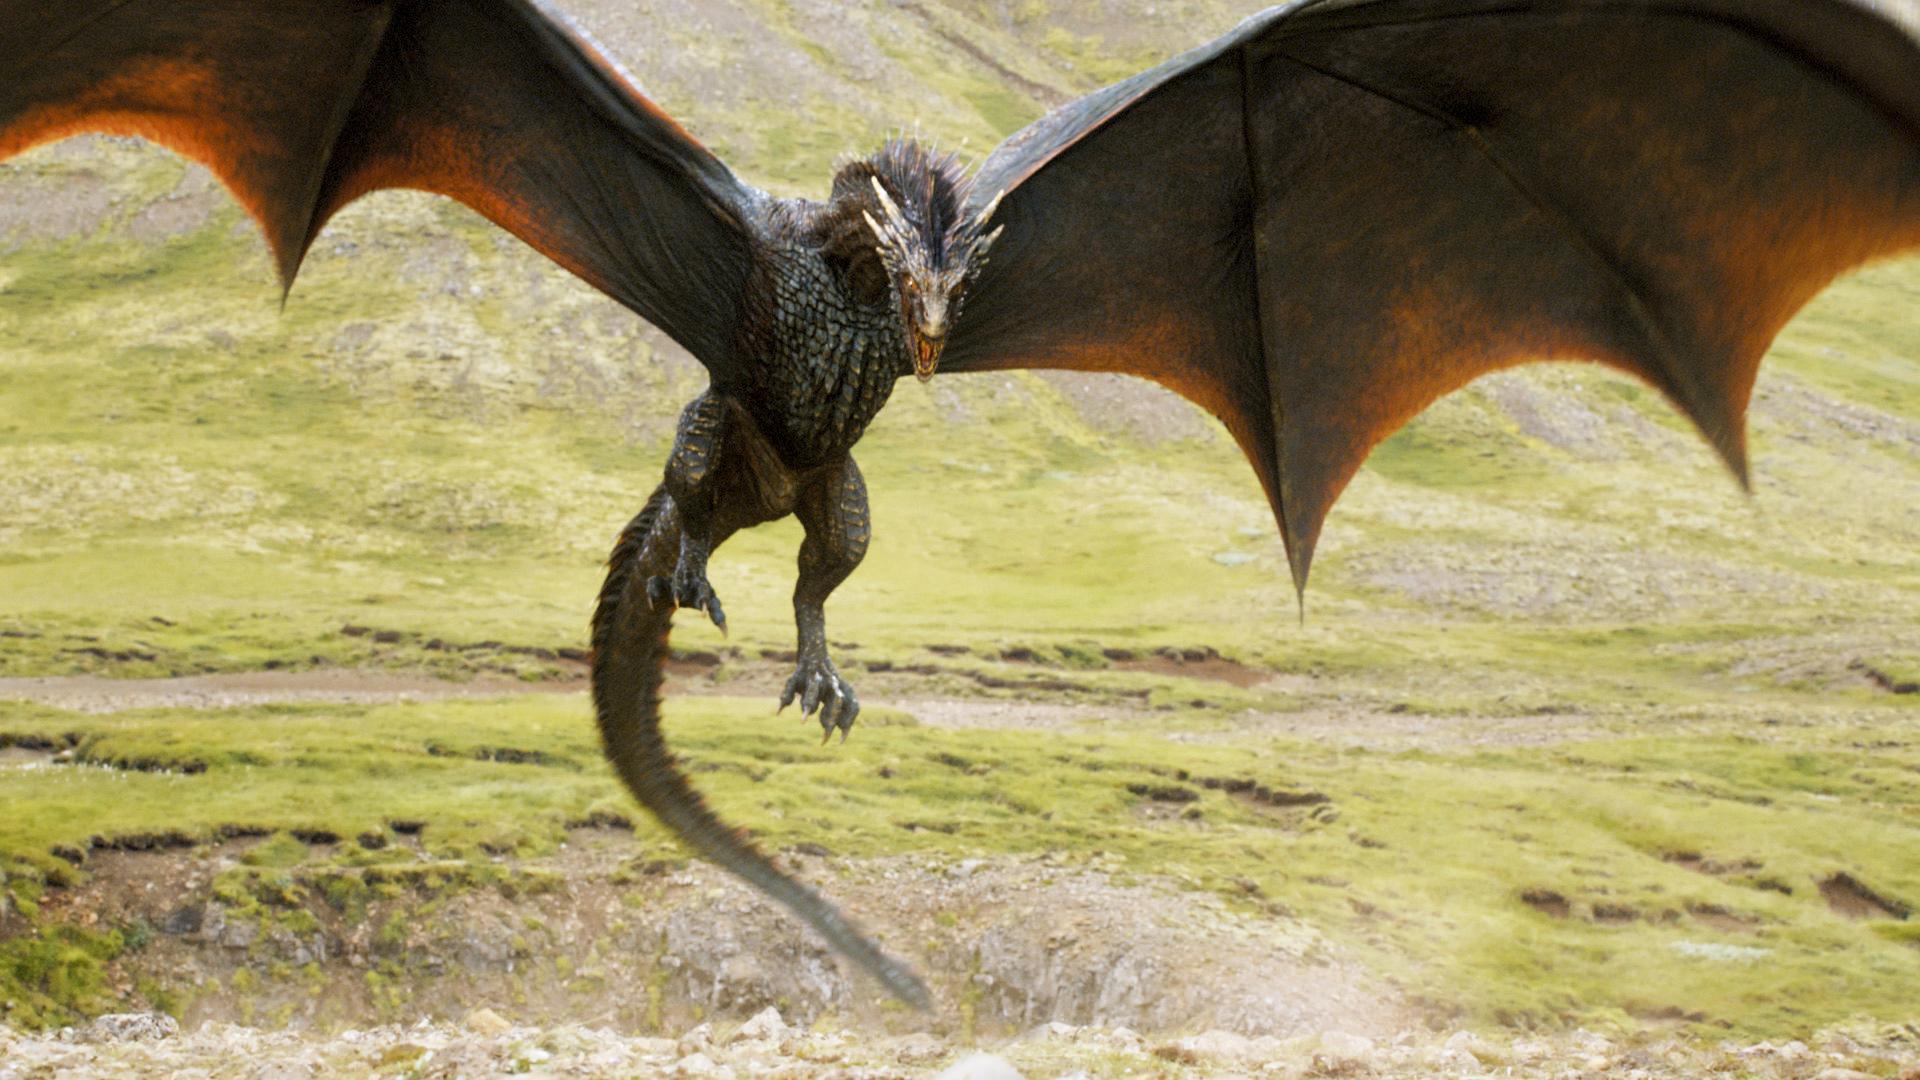 One of Daenerys's dragons.